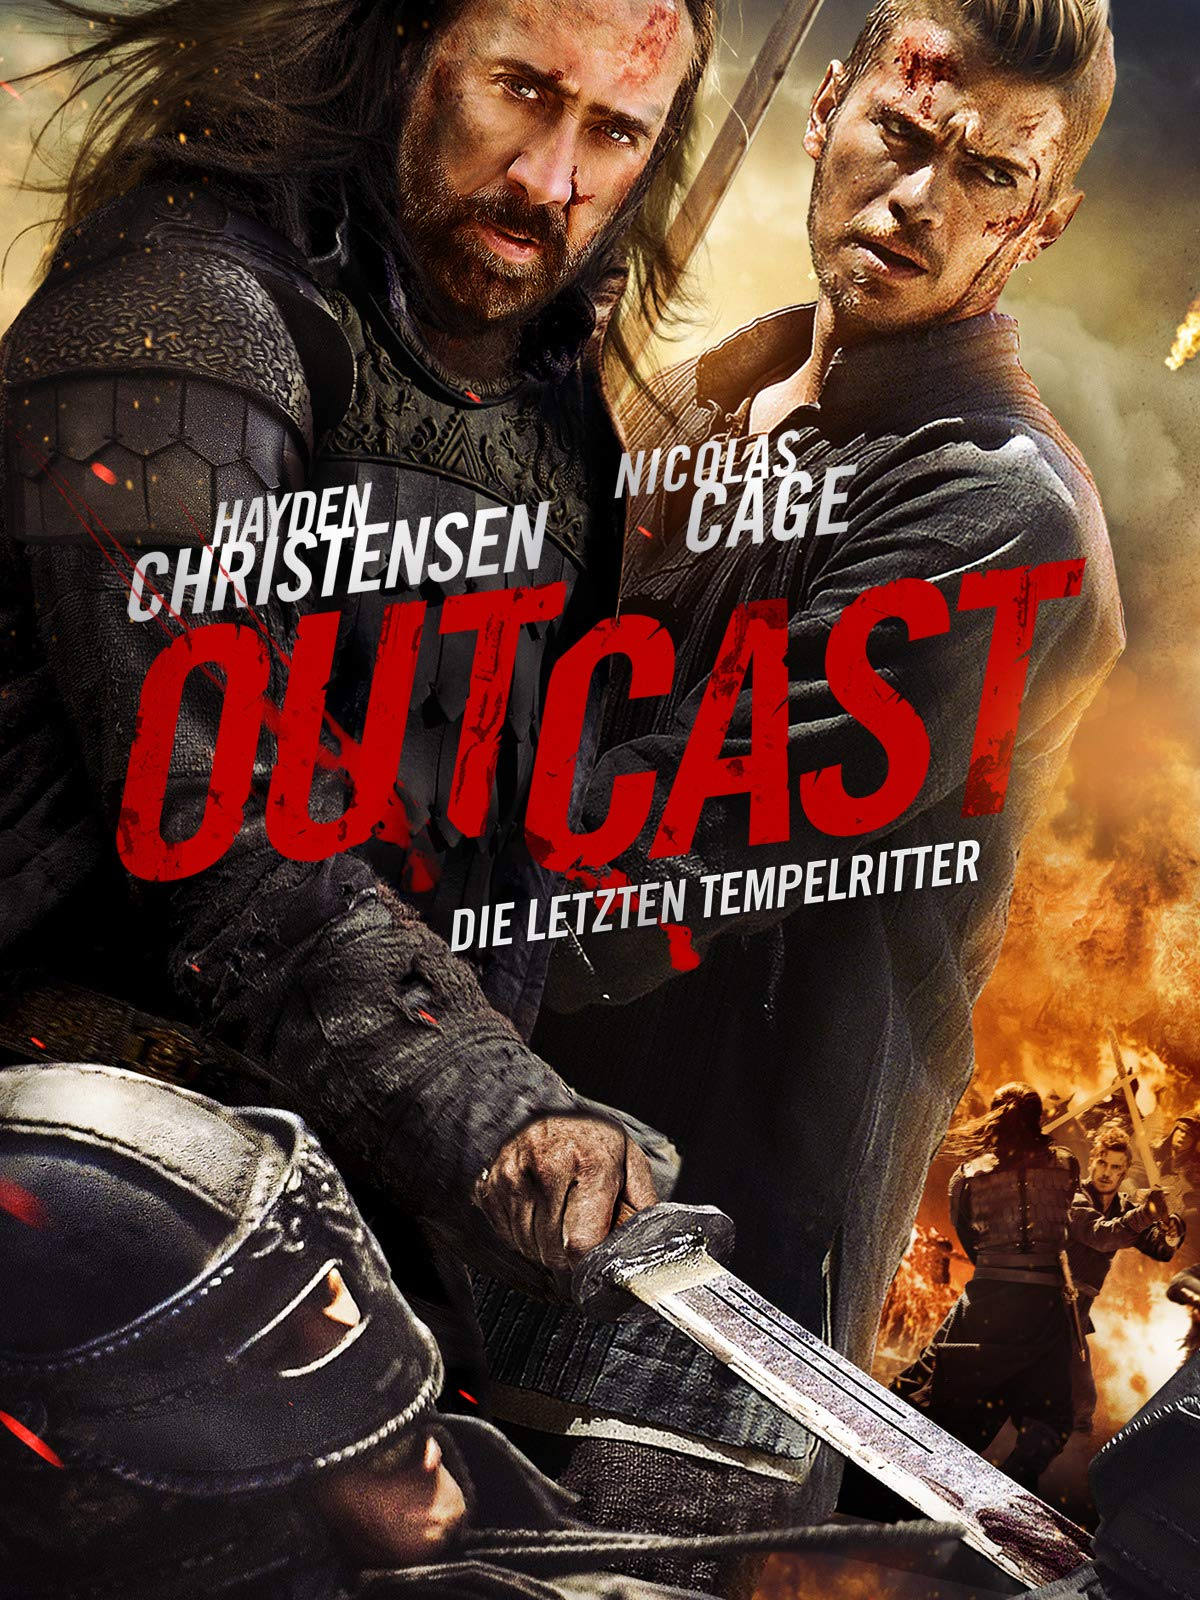 Outcast Die Letzten Tempelritter